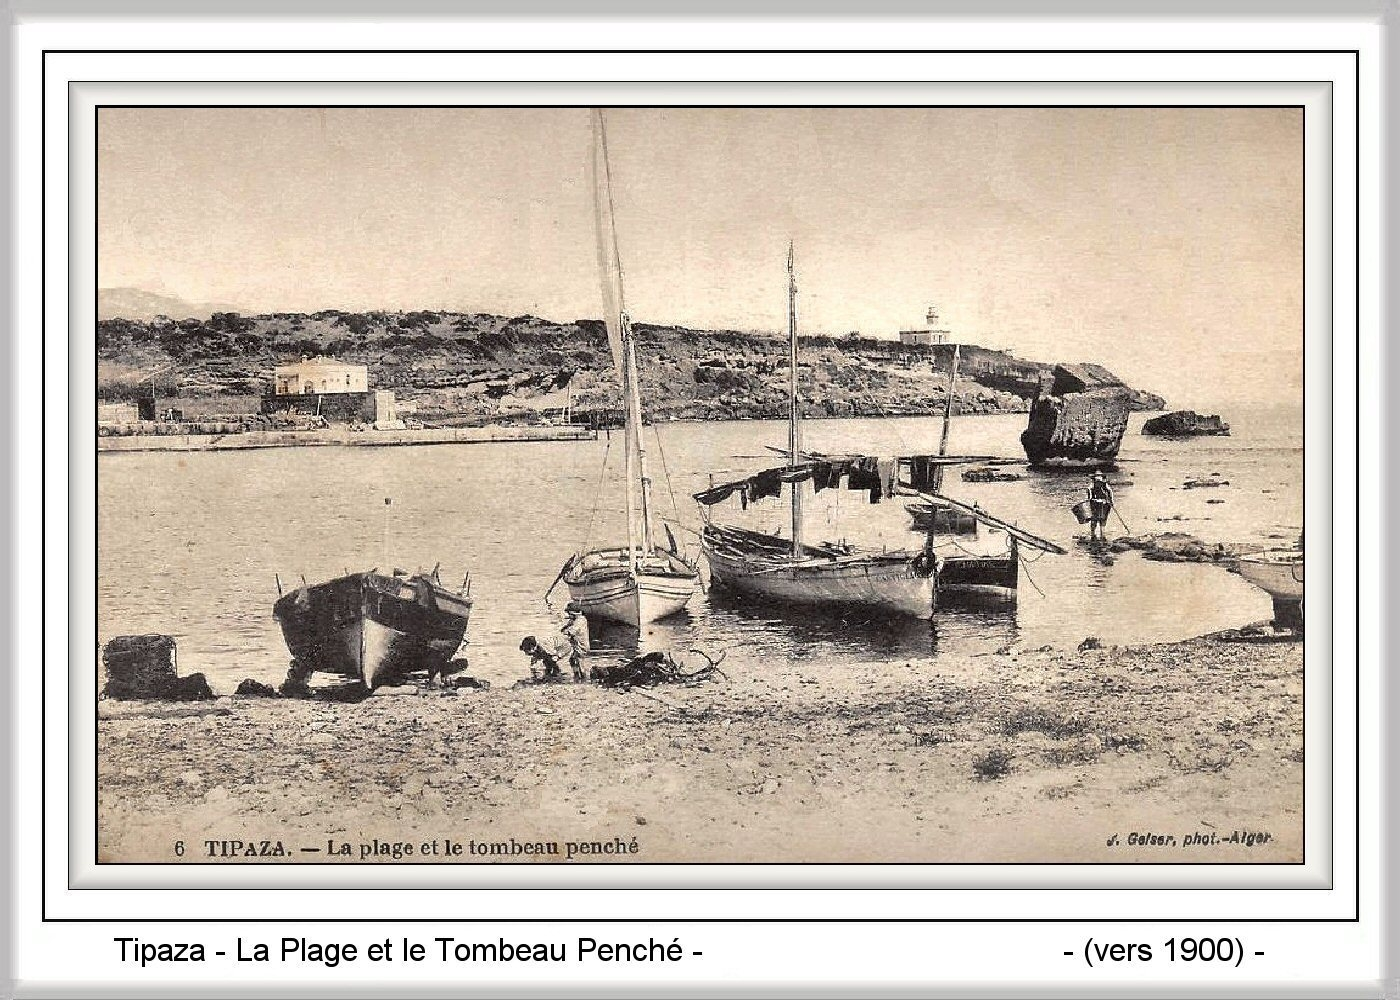 Carte Algerie Tipaza.Tipaza Carte Postale Ancienne Et Vue D Hier Et Aujourd Hui Geneanet